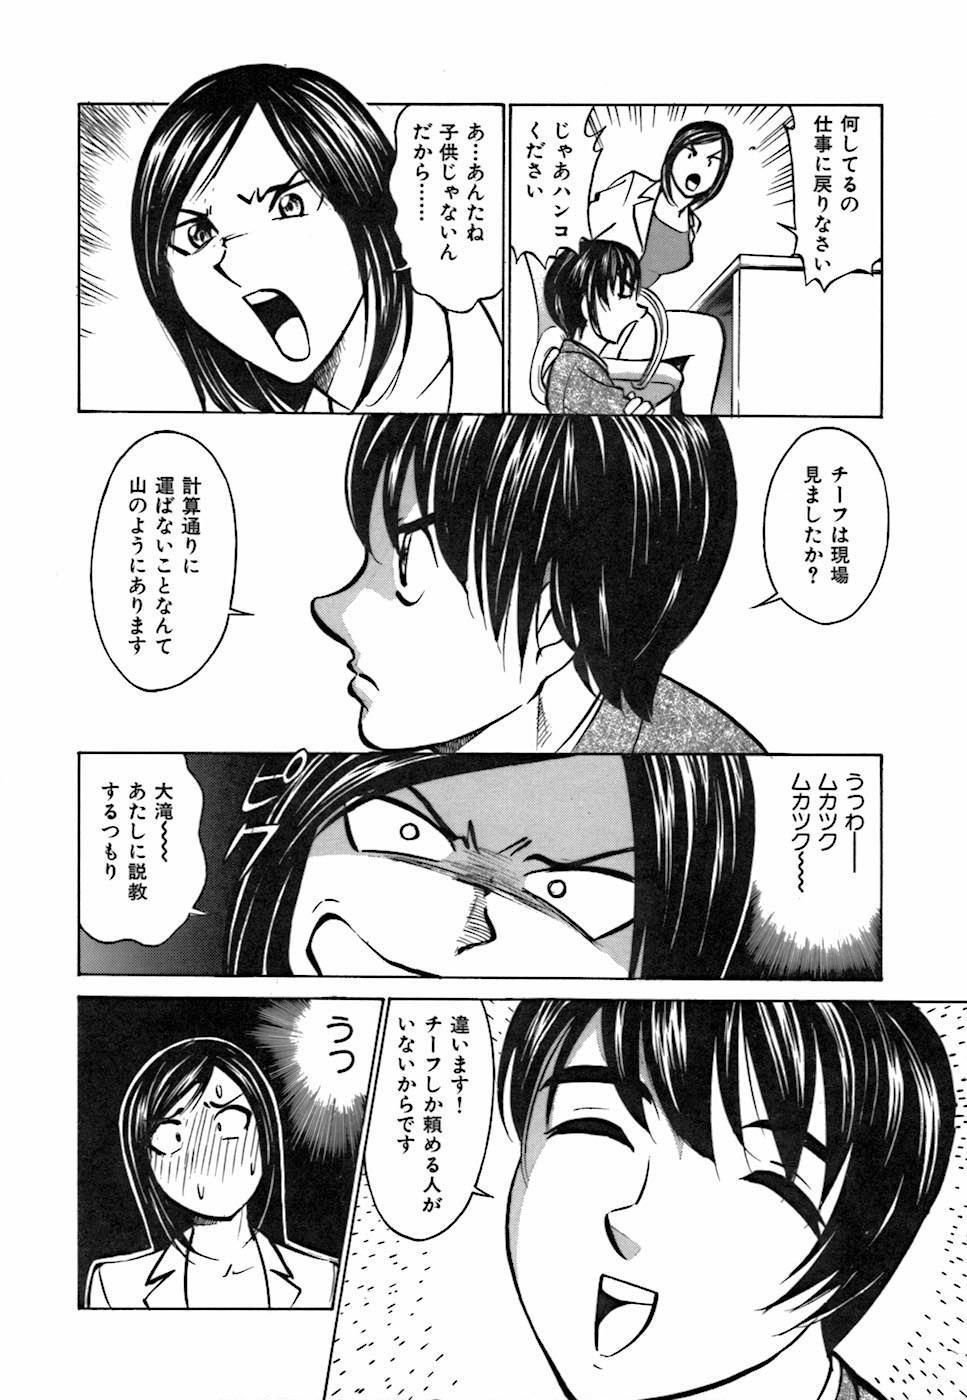 Kimi ga Nozomu Katachi | Appearance for which you hope 45